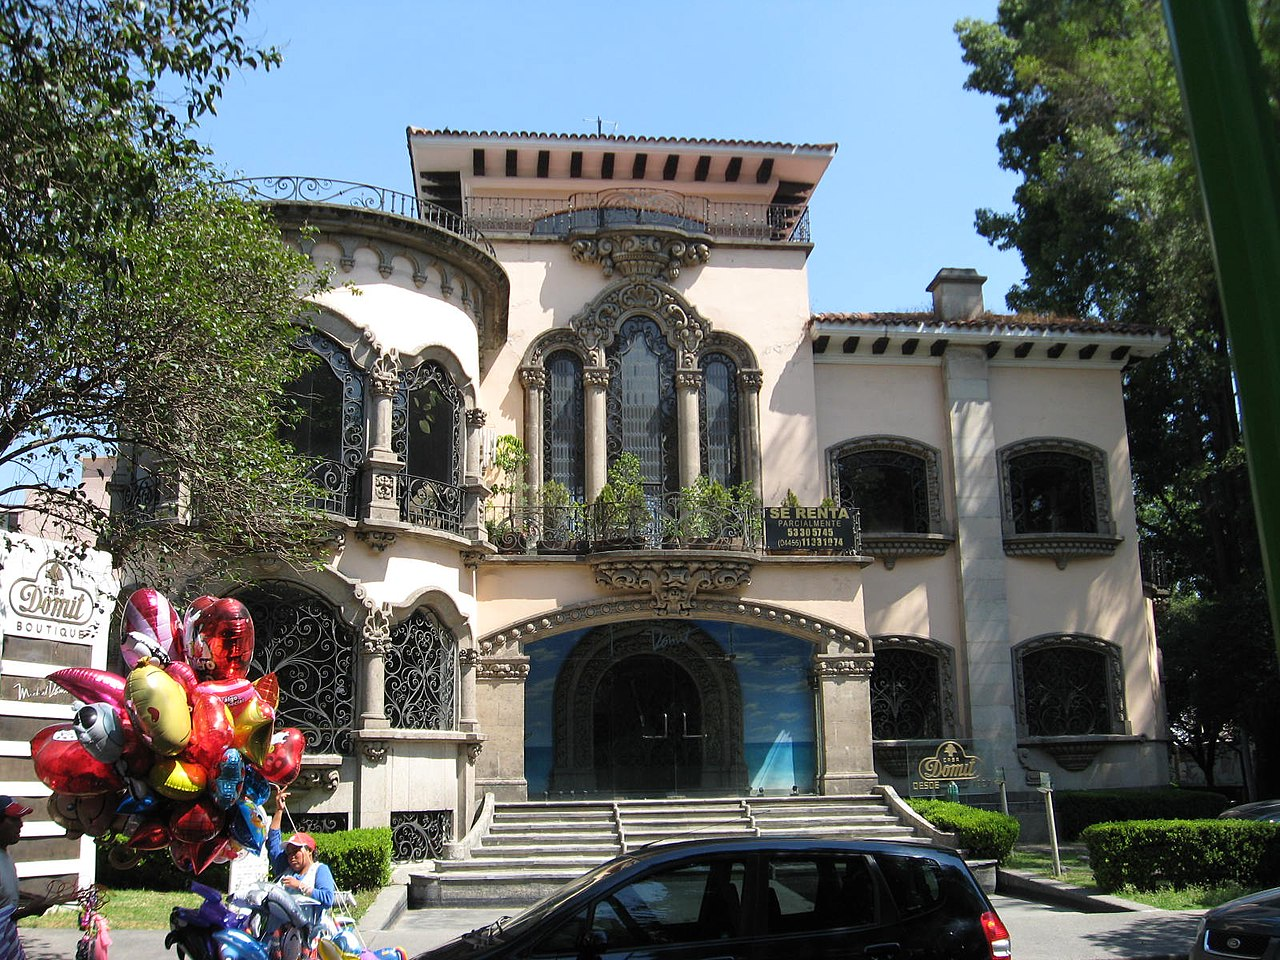 Forest Gate Apartments Magnolia Nj